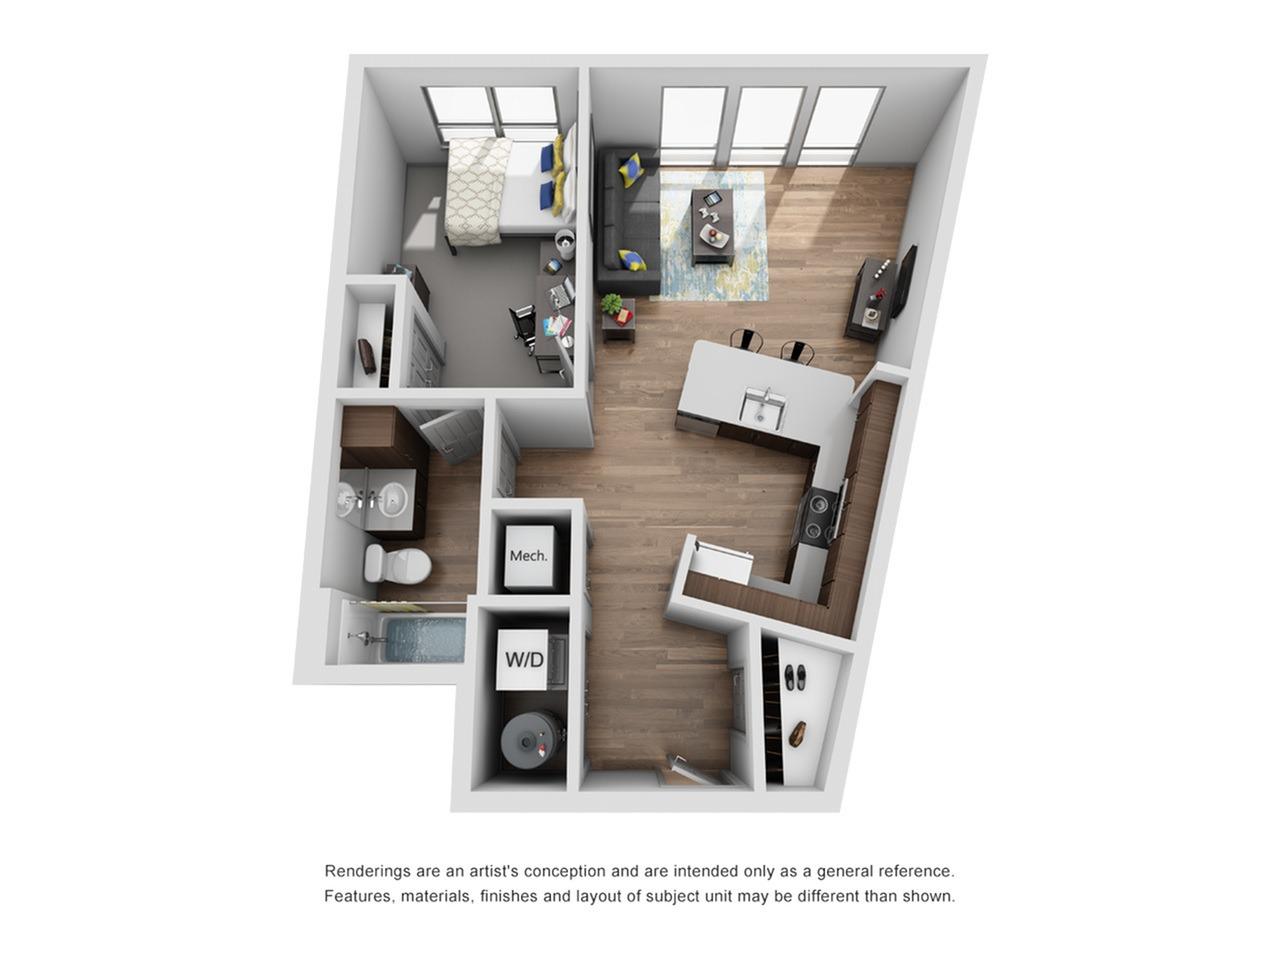 one bedroom apartment in ann arbor